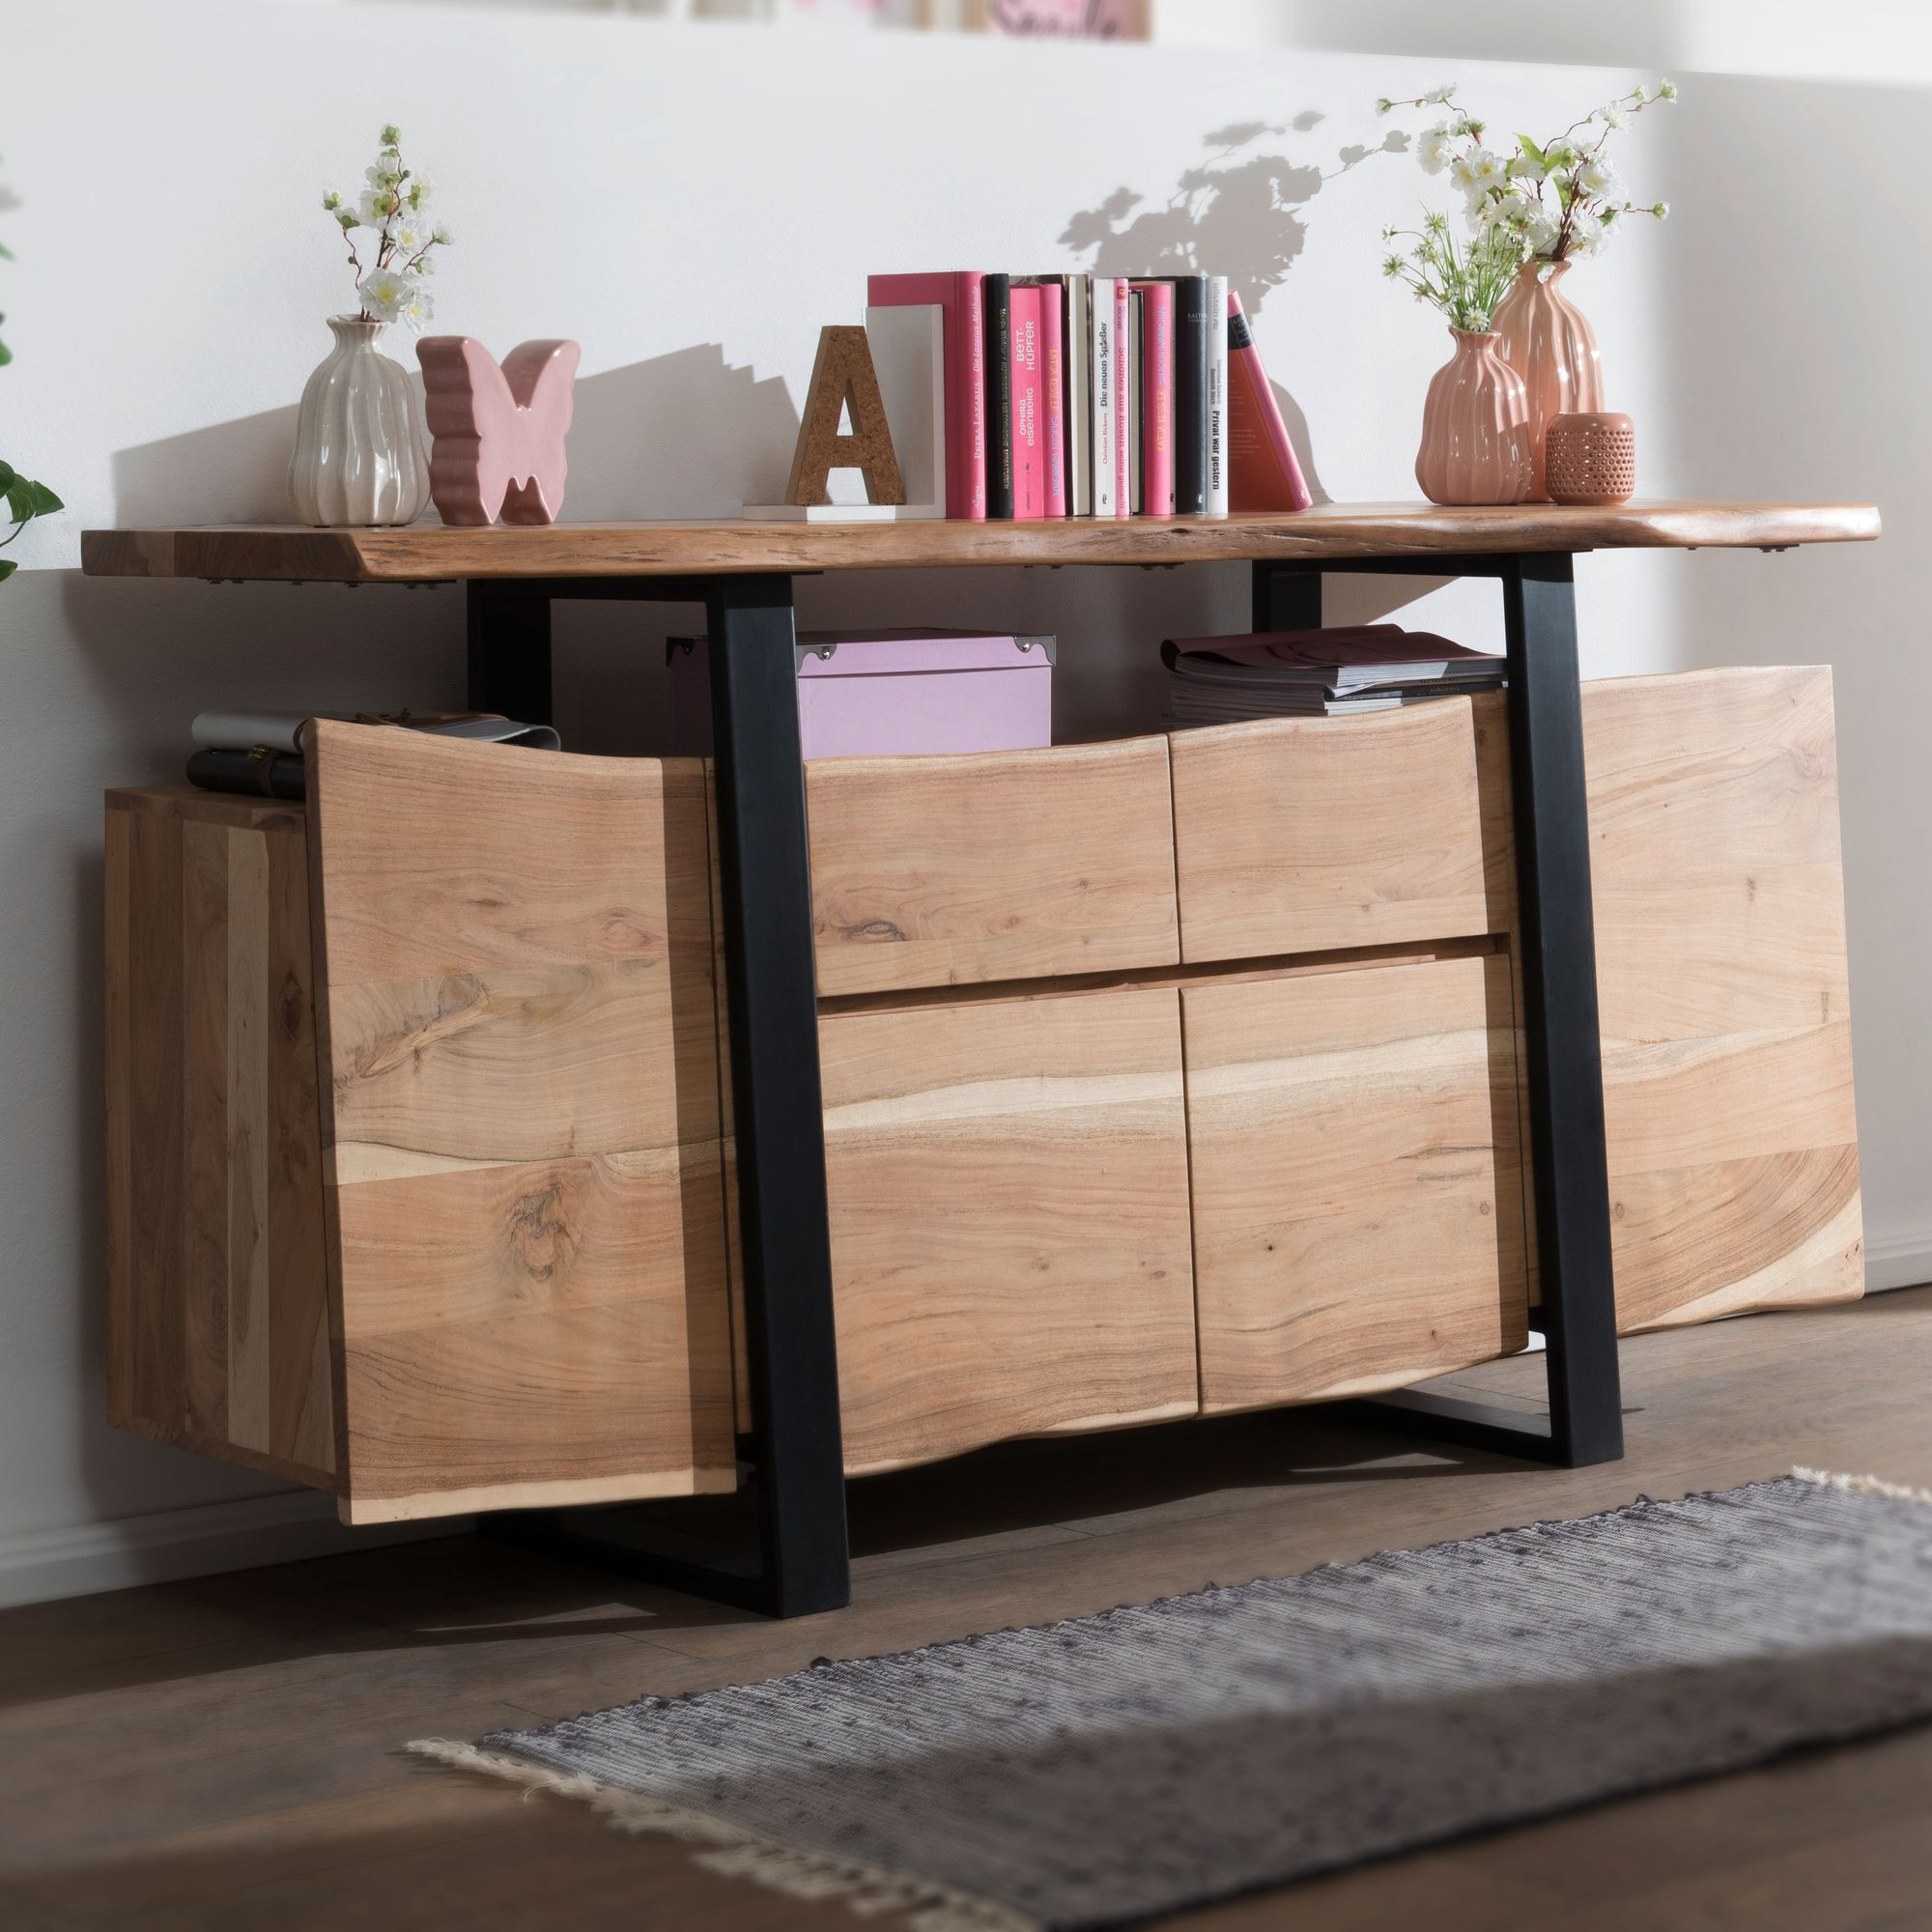 Finebuy Sideboard Akazie Baumkante Kommode Massiv Holz 175 Cm